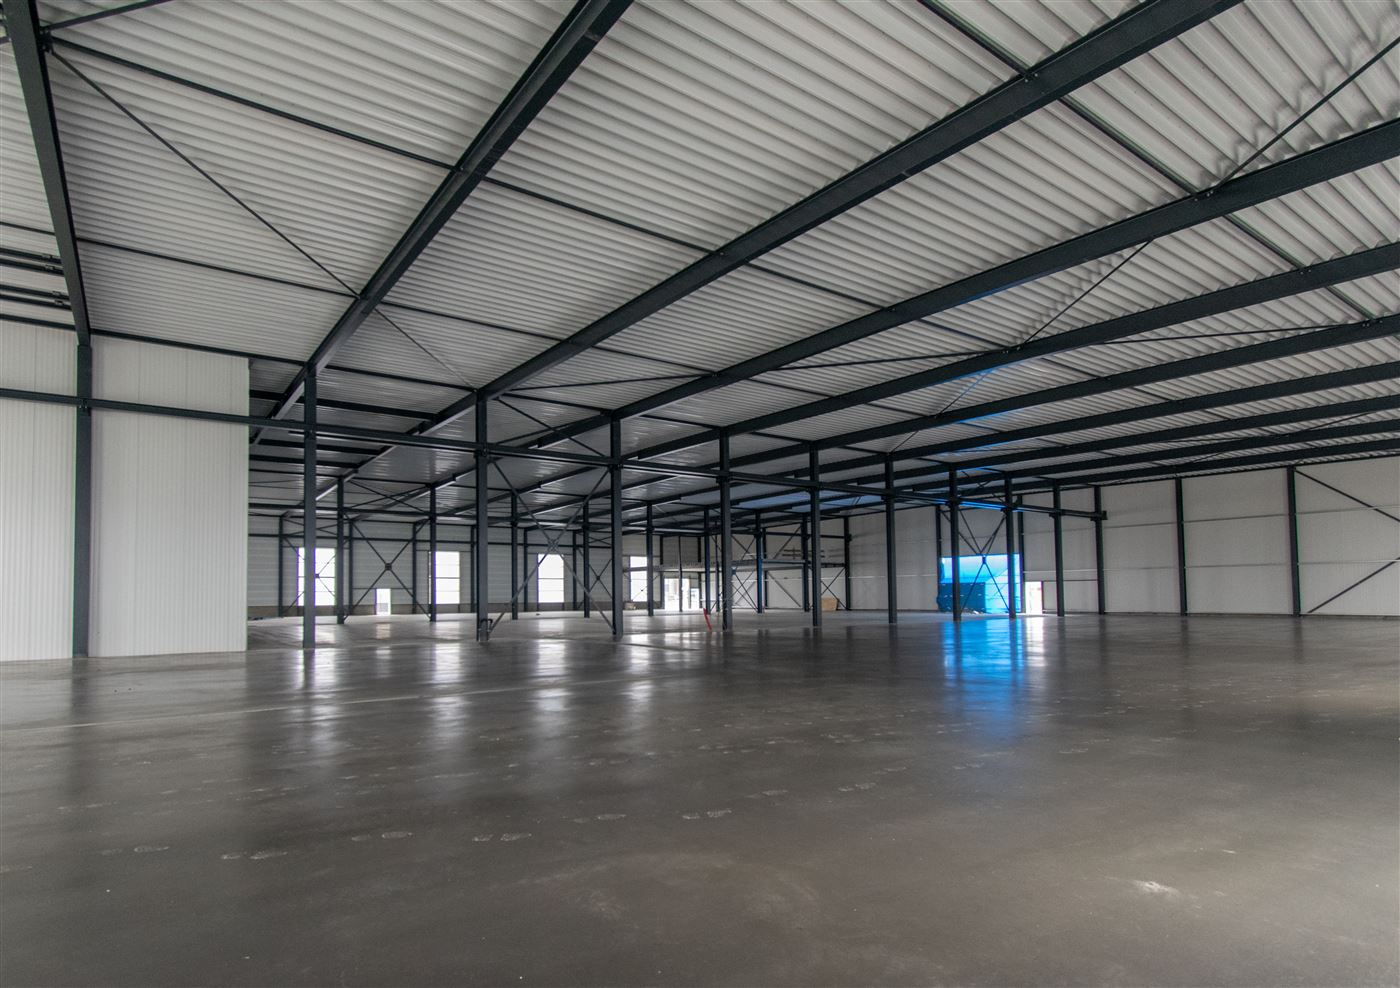 bedrijfspand betonvloer